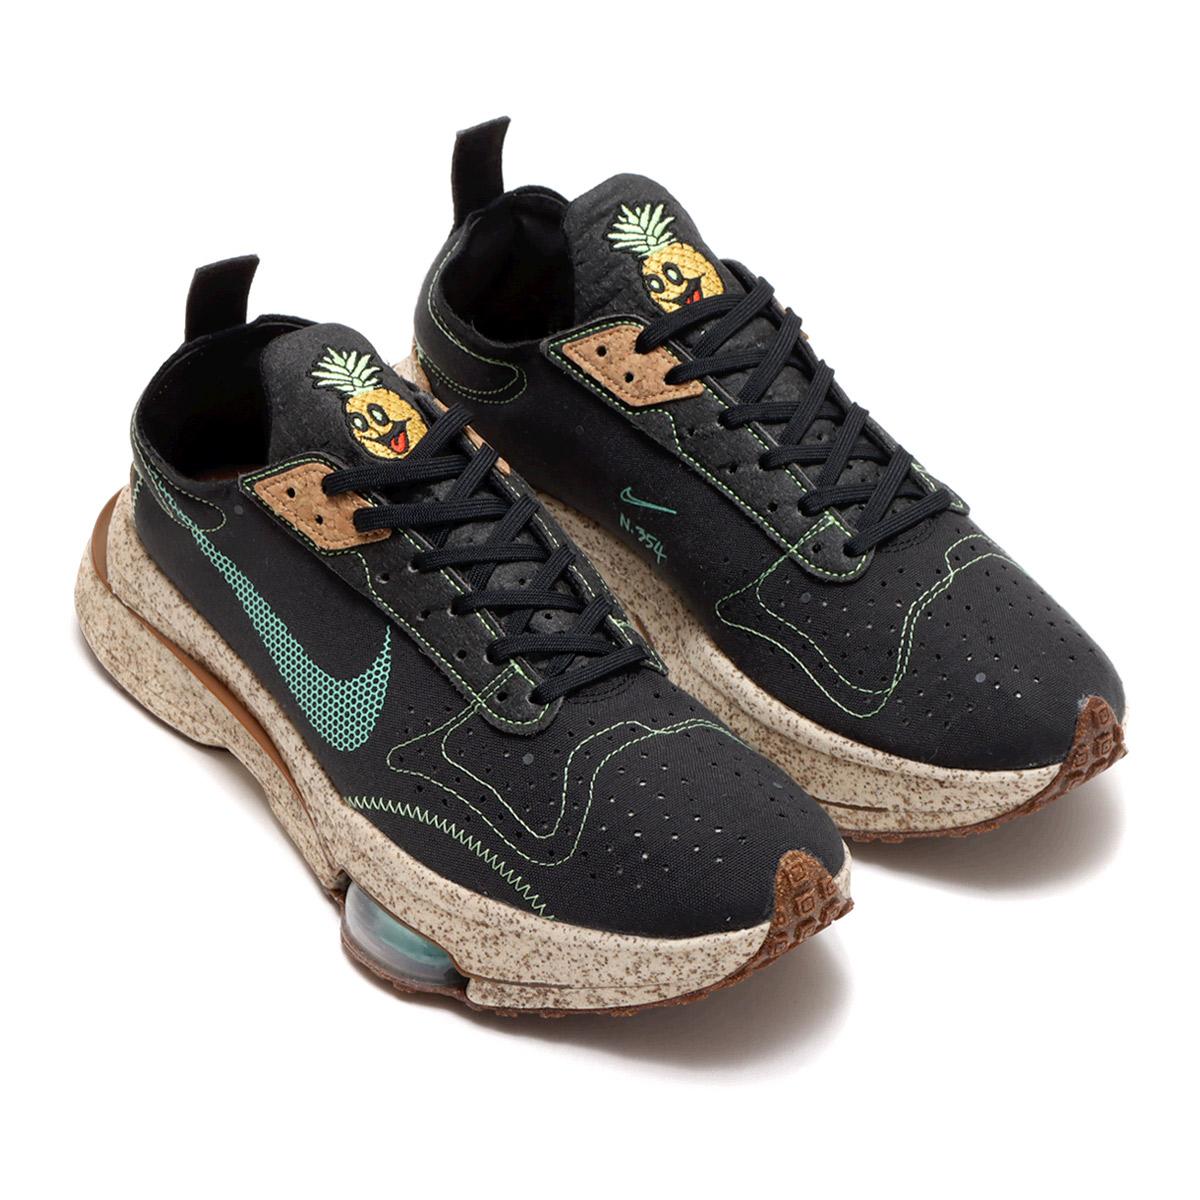 "Nike Air Zoom Type Premium ""Happy Pineapple"" DC5632-001"